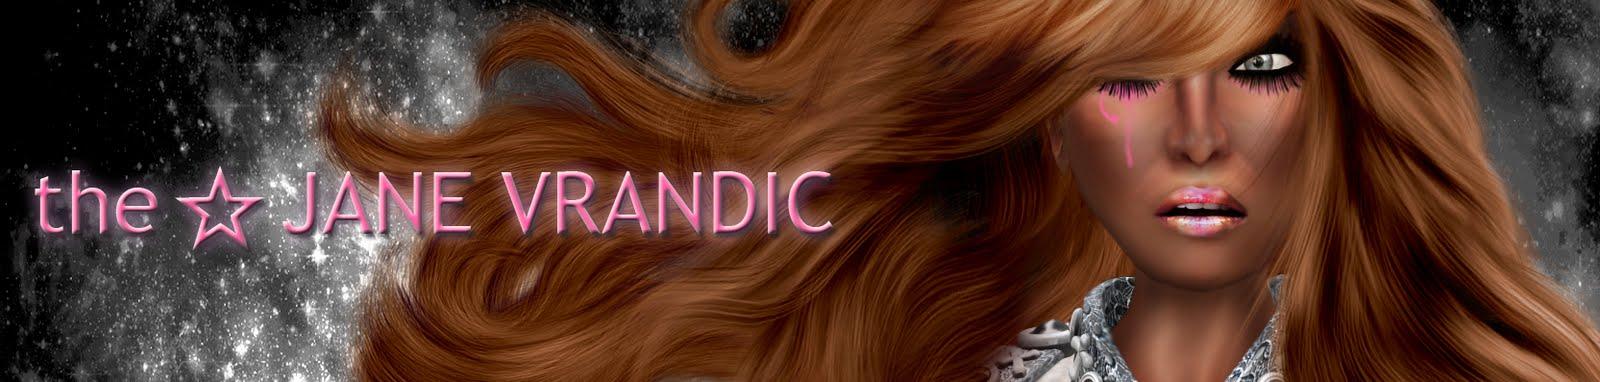 Jane Vrandic